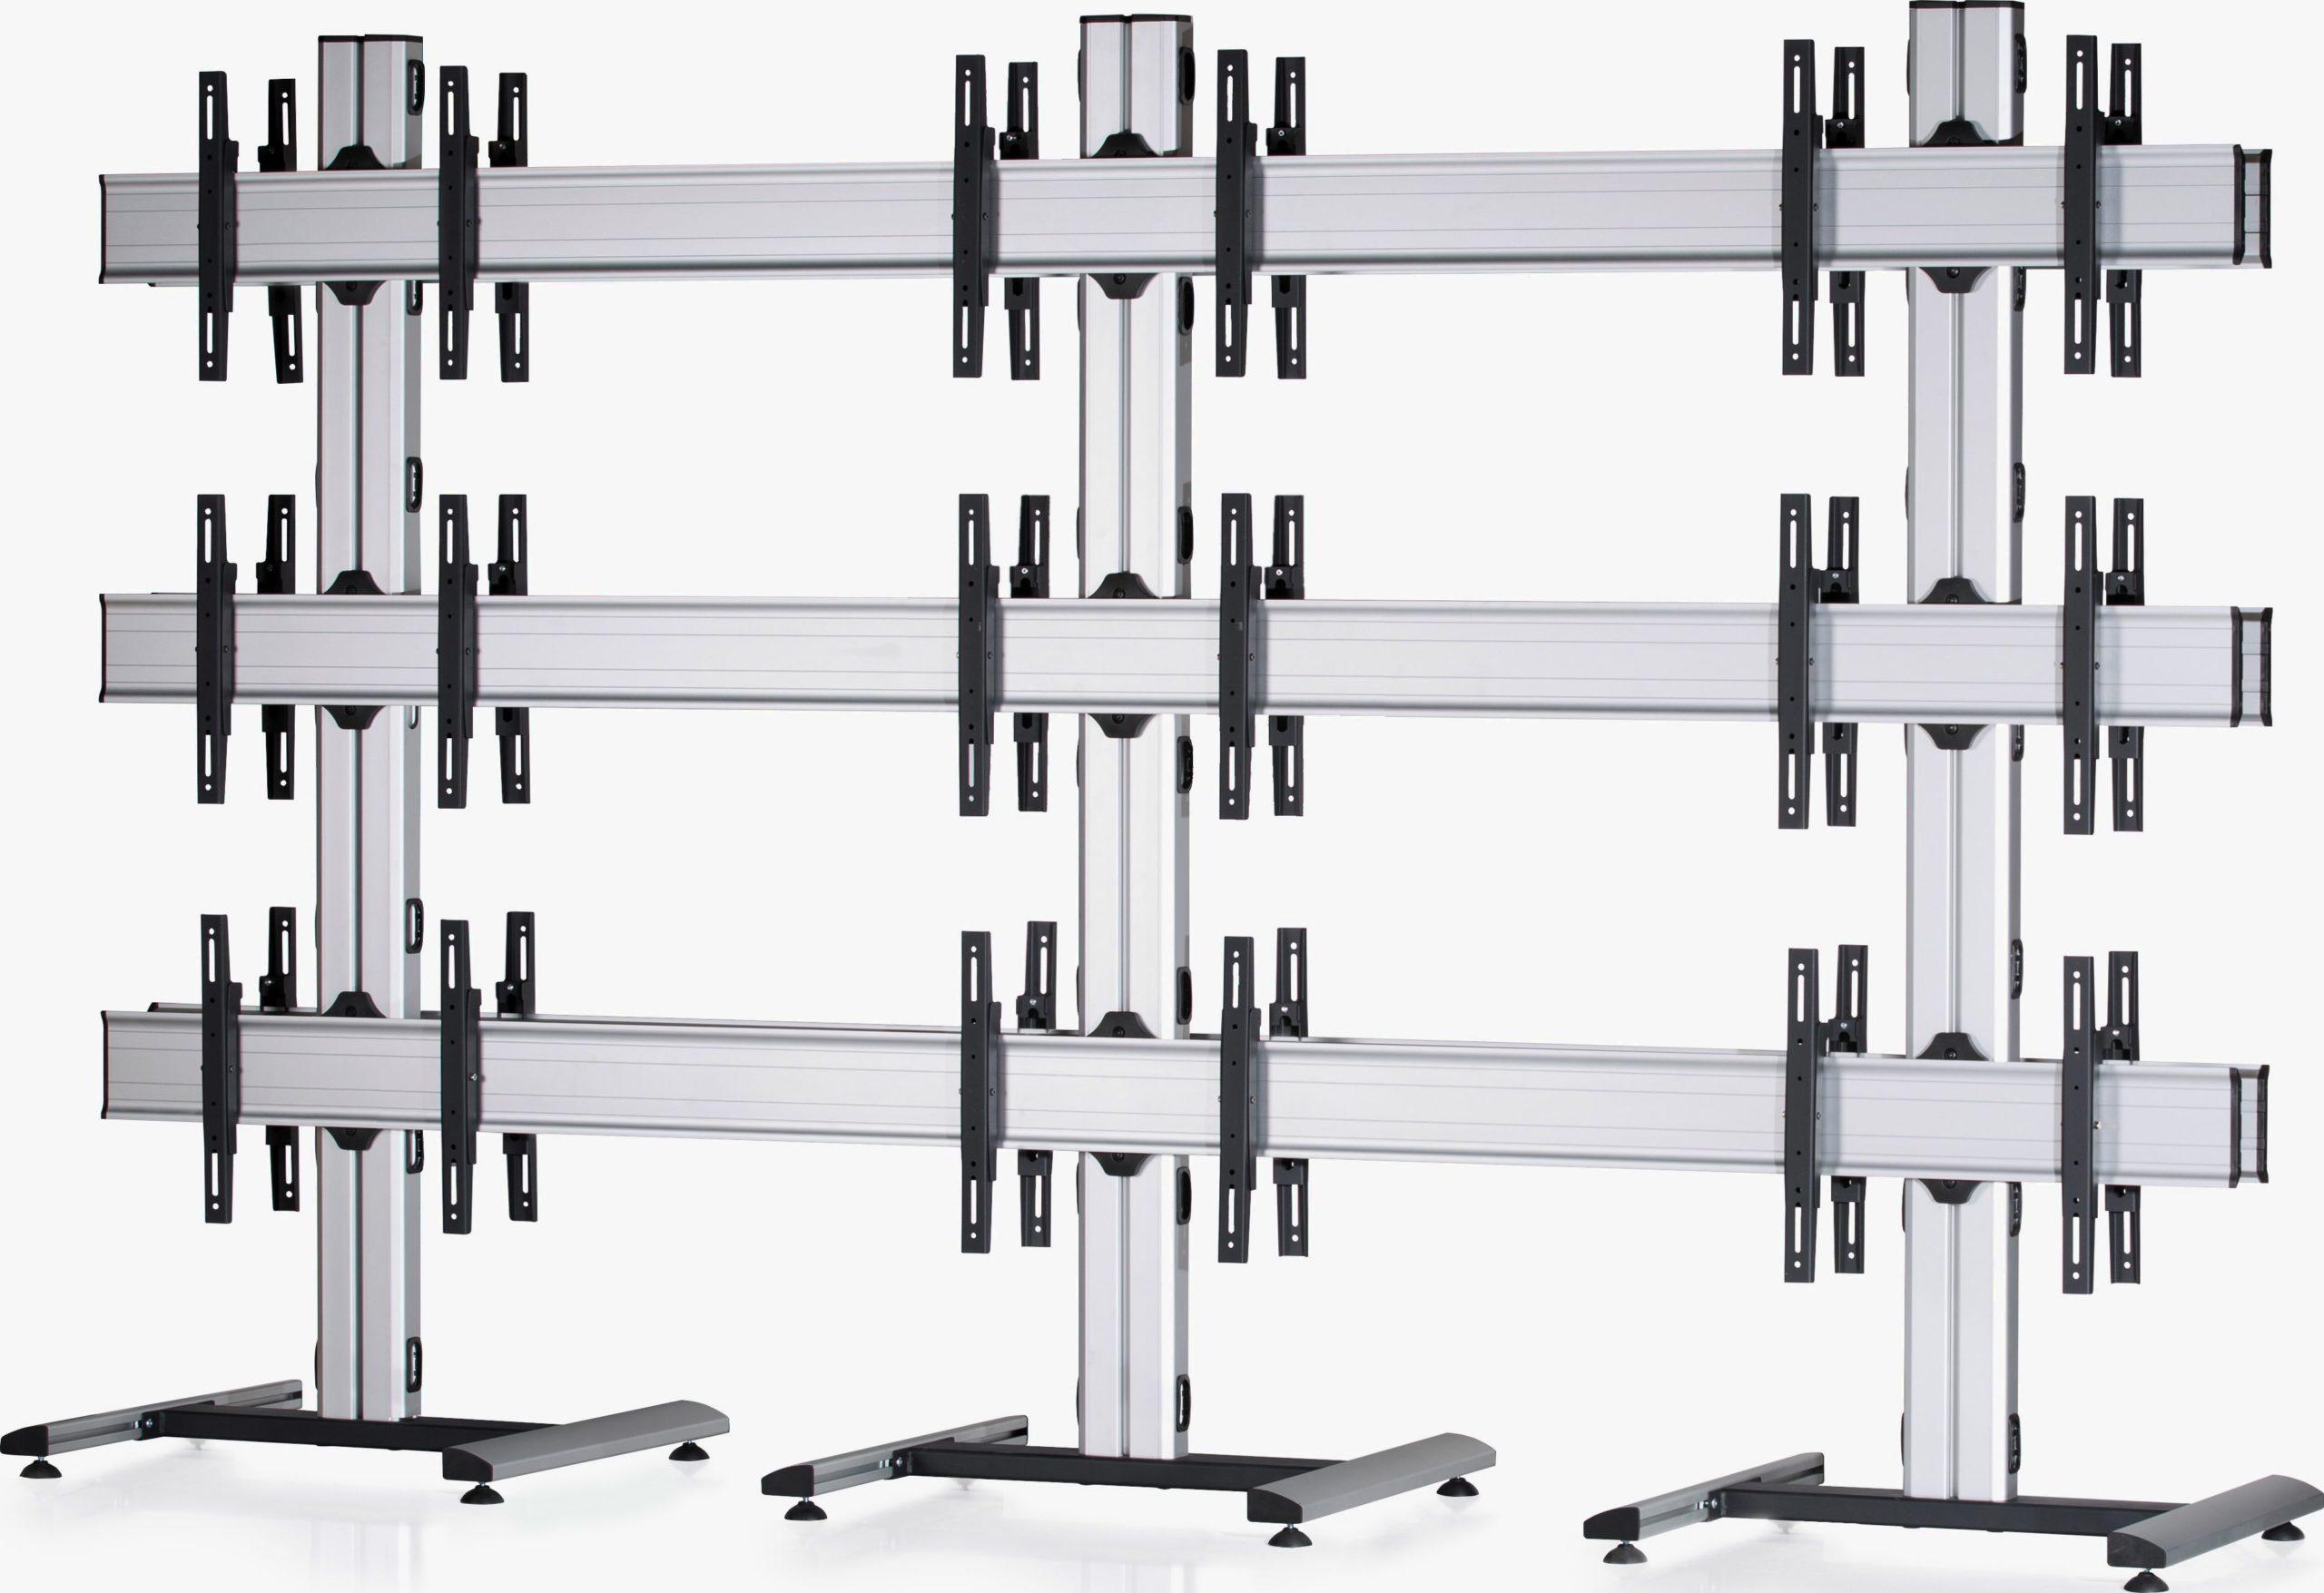 18 Displays 3×3 beidseitig, Standard-VESA, auf Standfuß